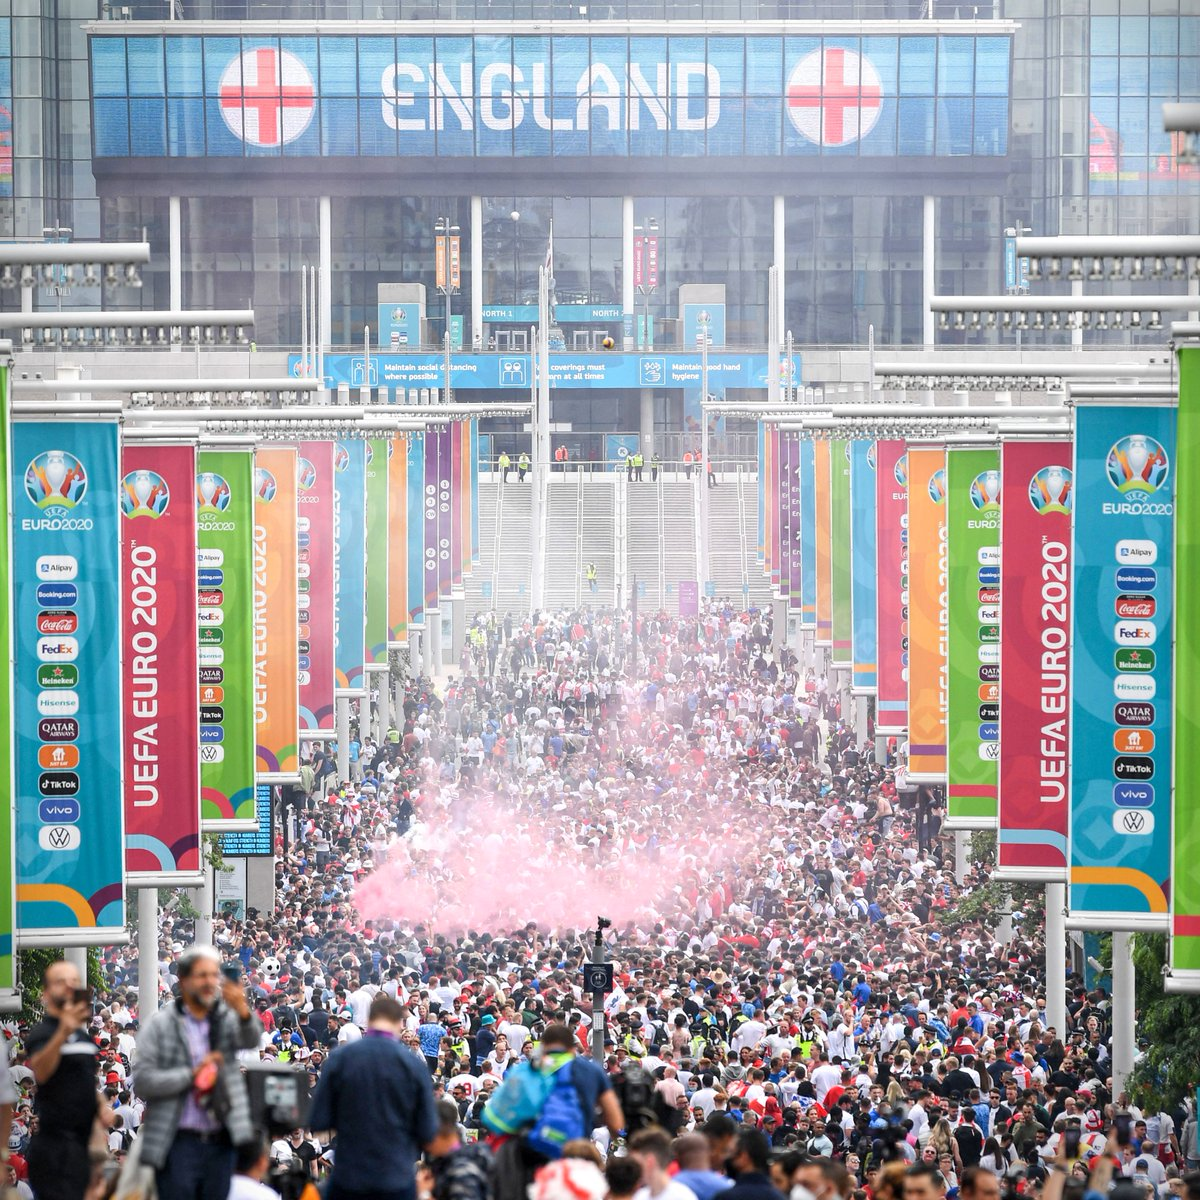 @brfootball's photo on Wembley